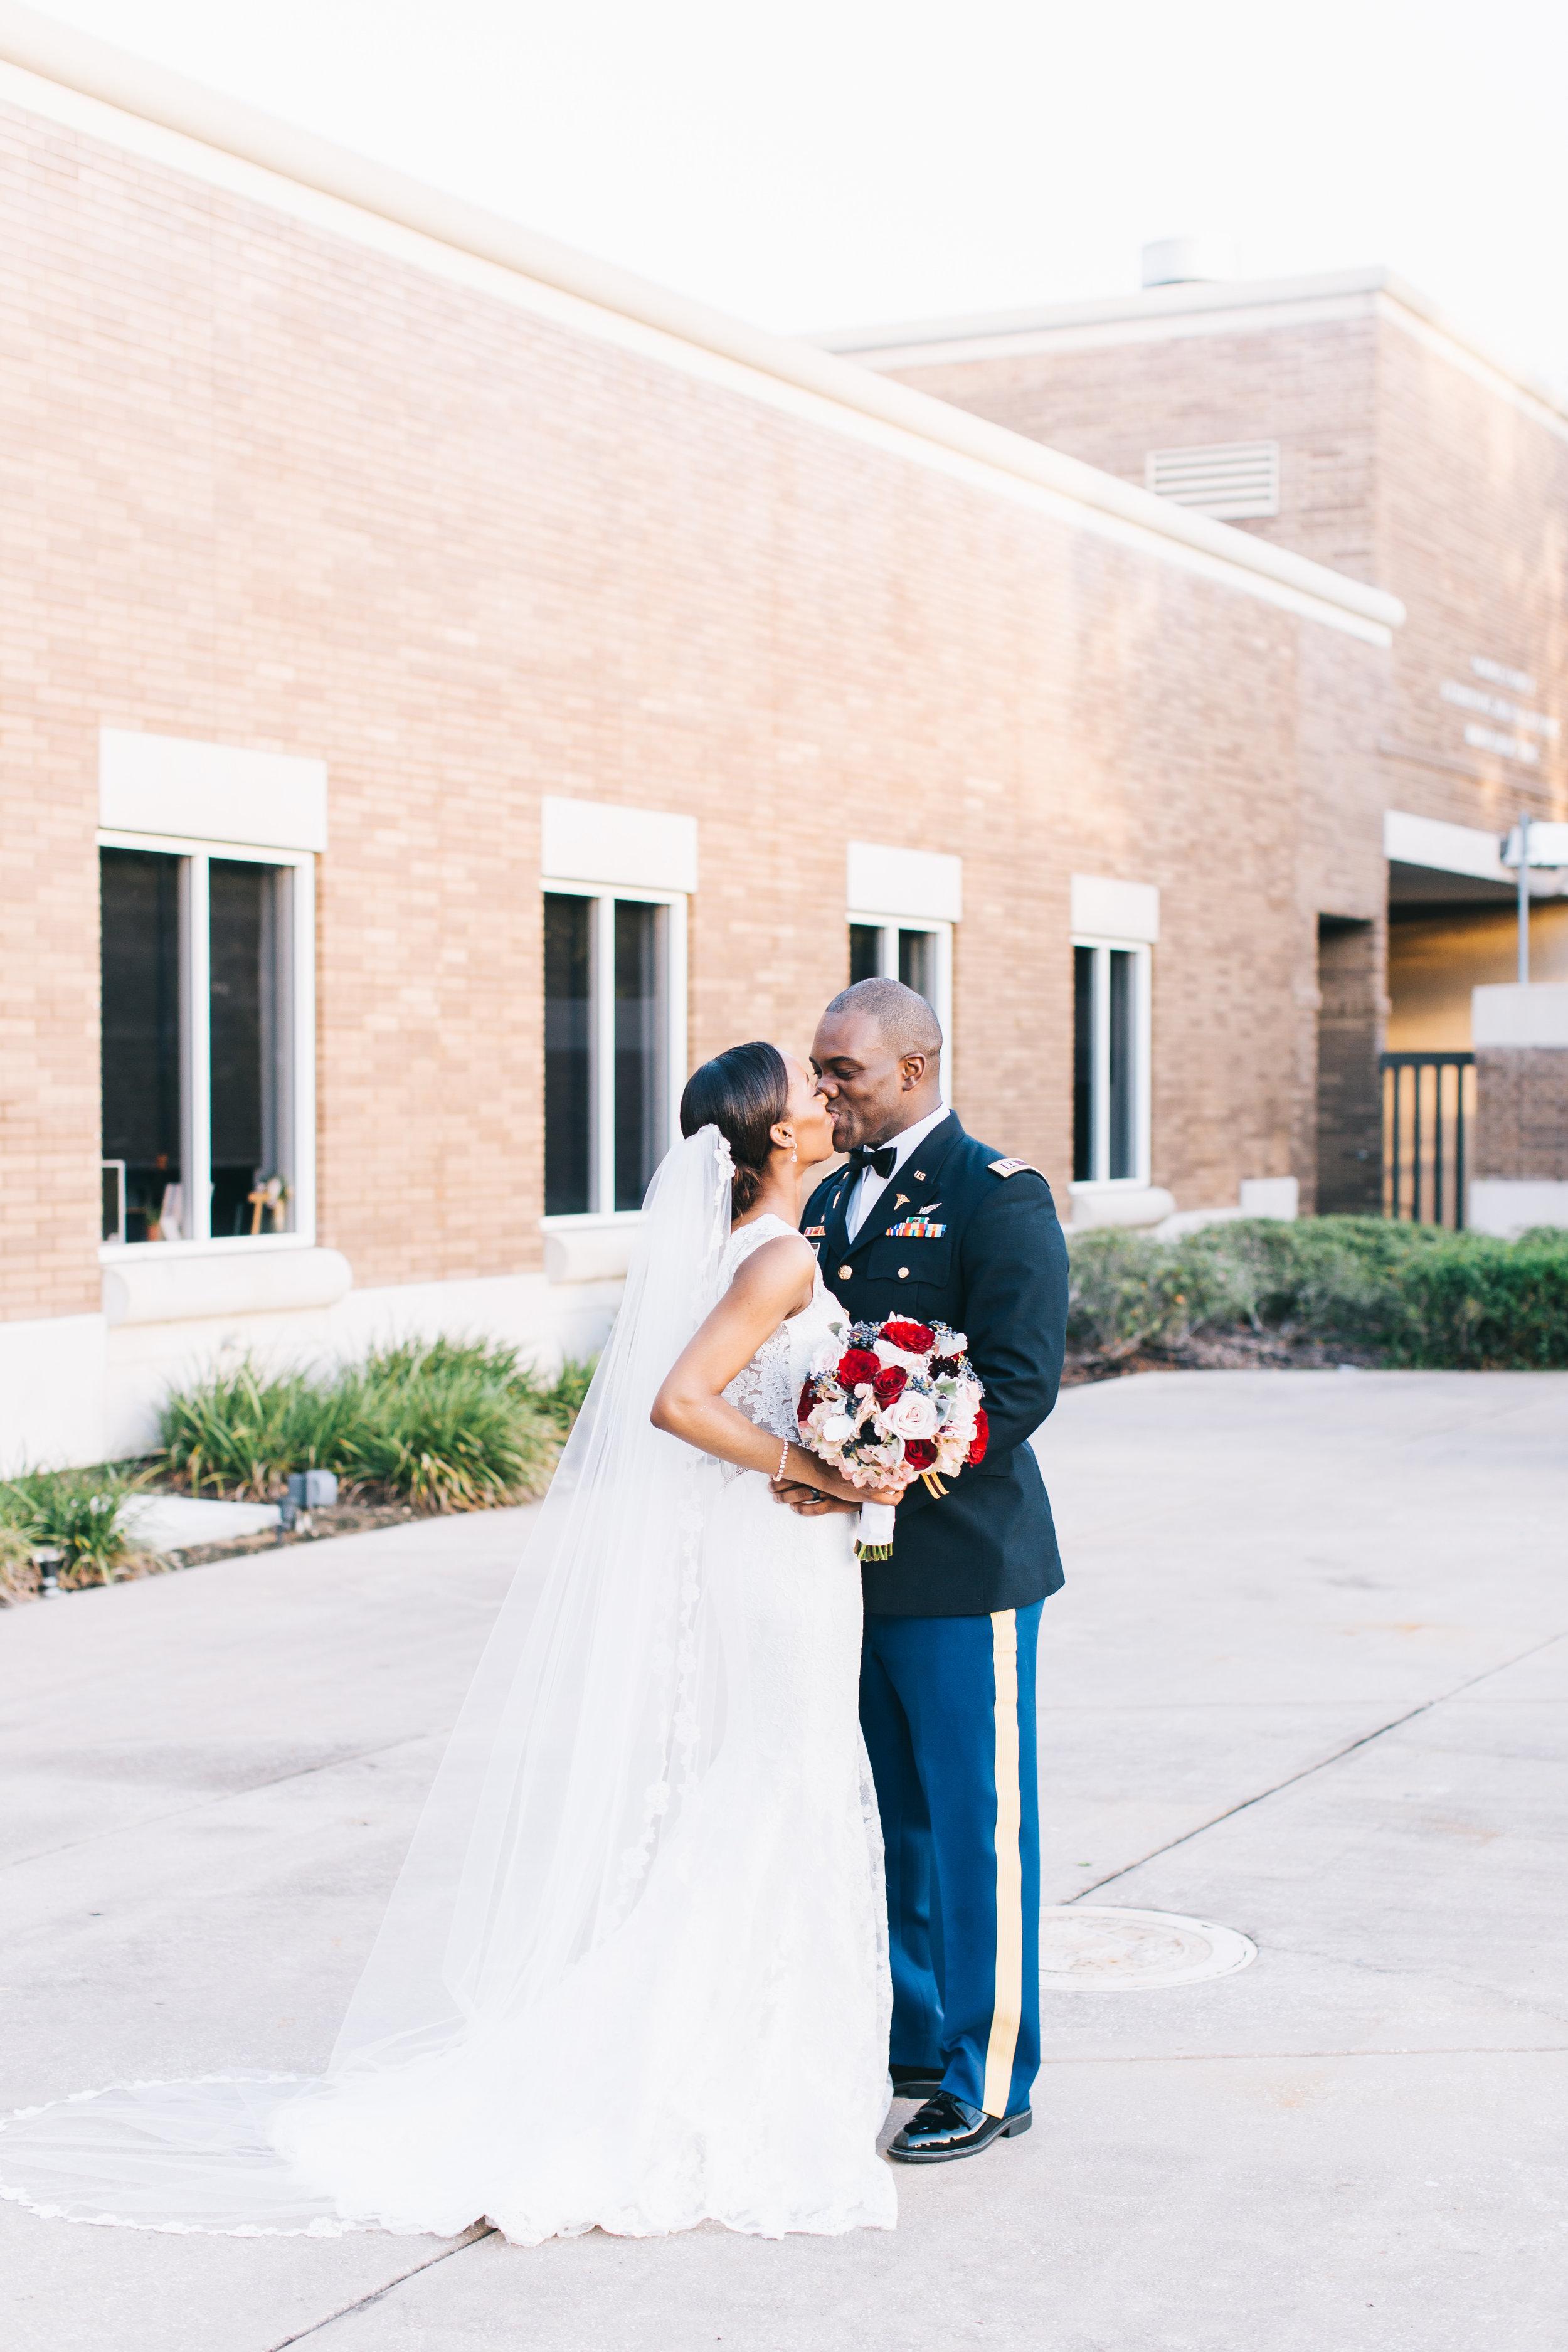 Bluegrass Chic - Military Wedding